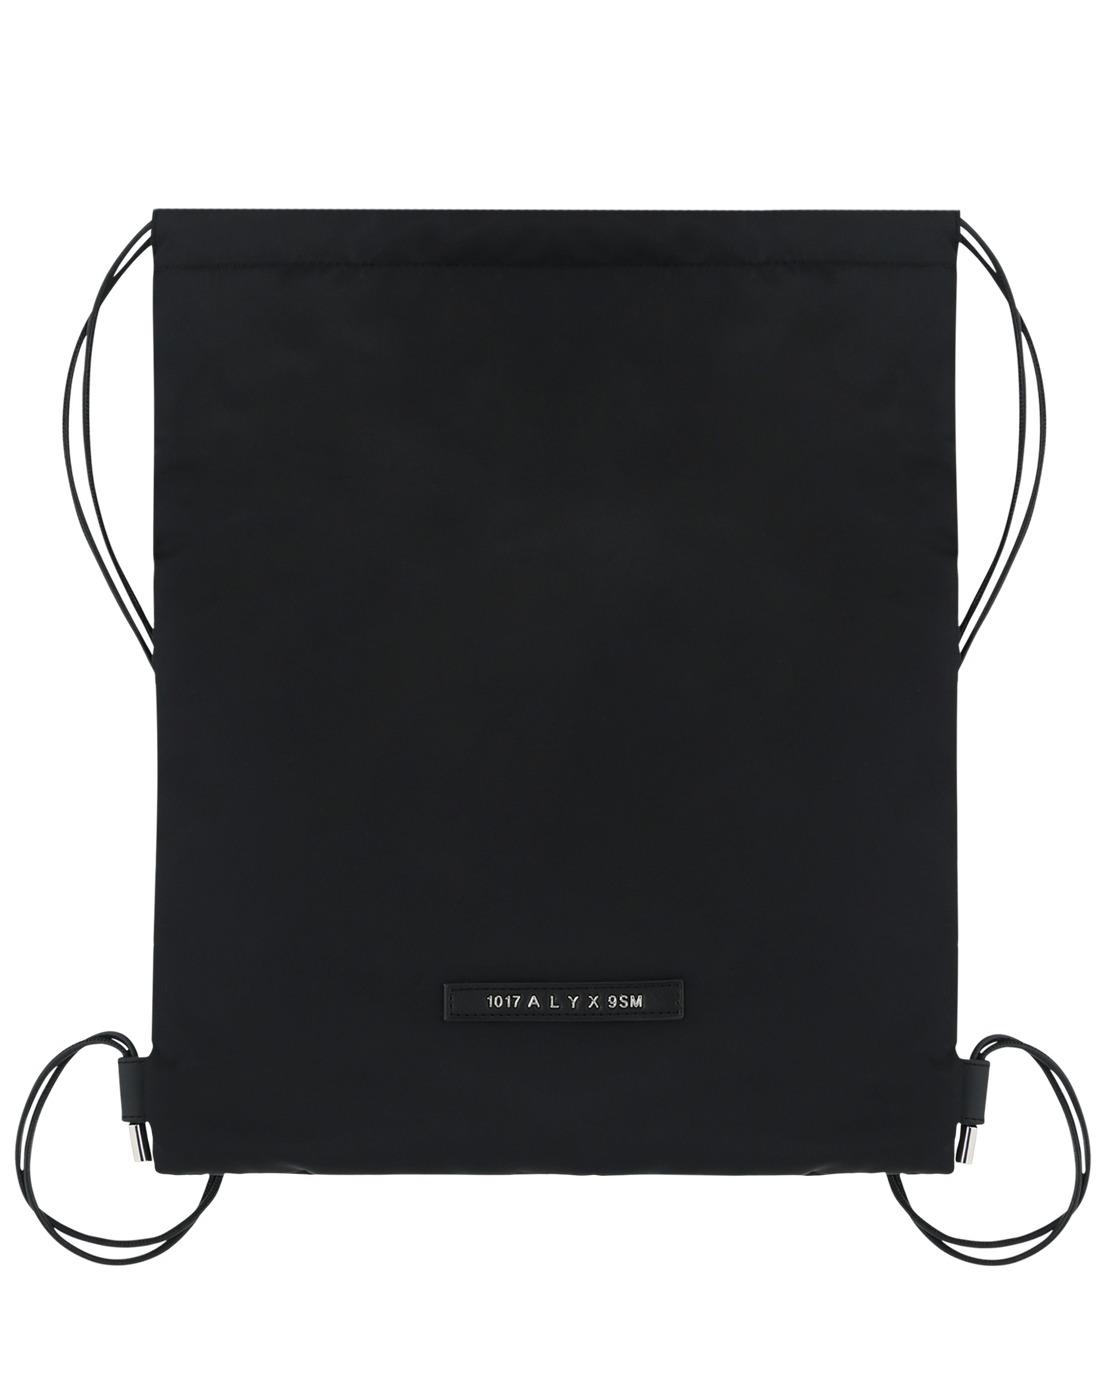 Photo: 1017 Alyx 9sm Re Nylon Drawstring Backpack Black